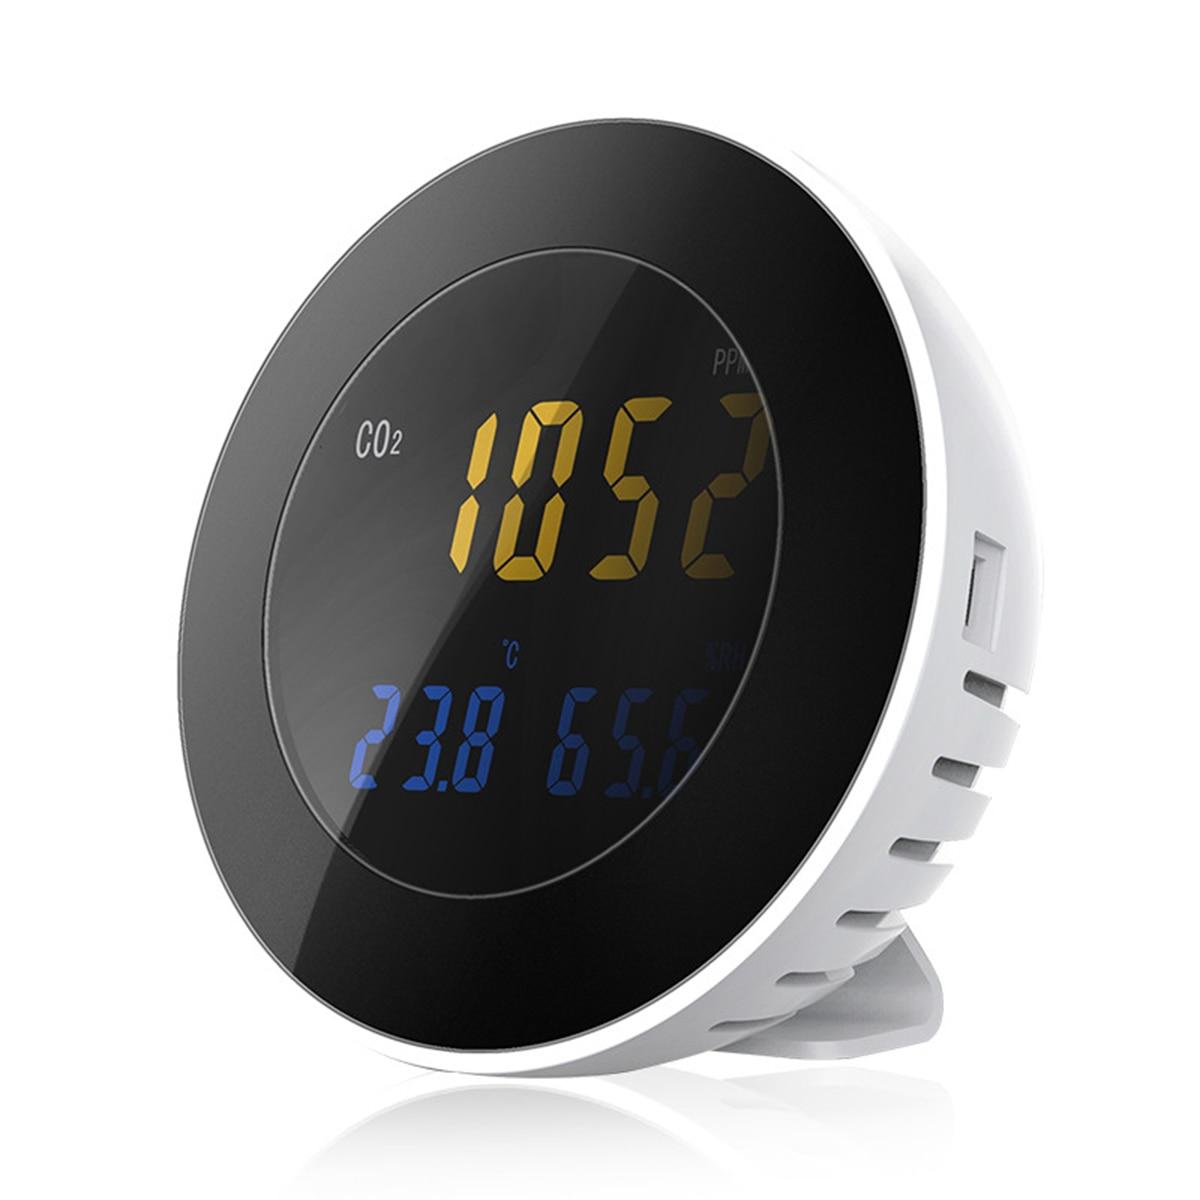 Retail Hti NEW HT-501 3 in 1 Co2 Meter Temperature Hygrometer Digital Portable Gas Leak Detector Analyzer co2 Monitor Tester недорого